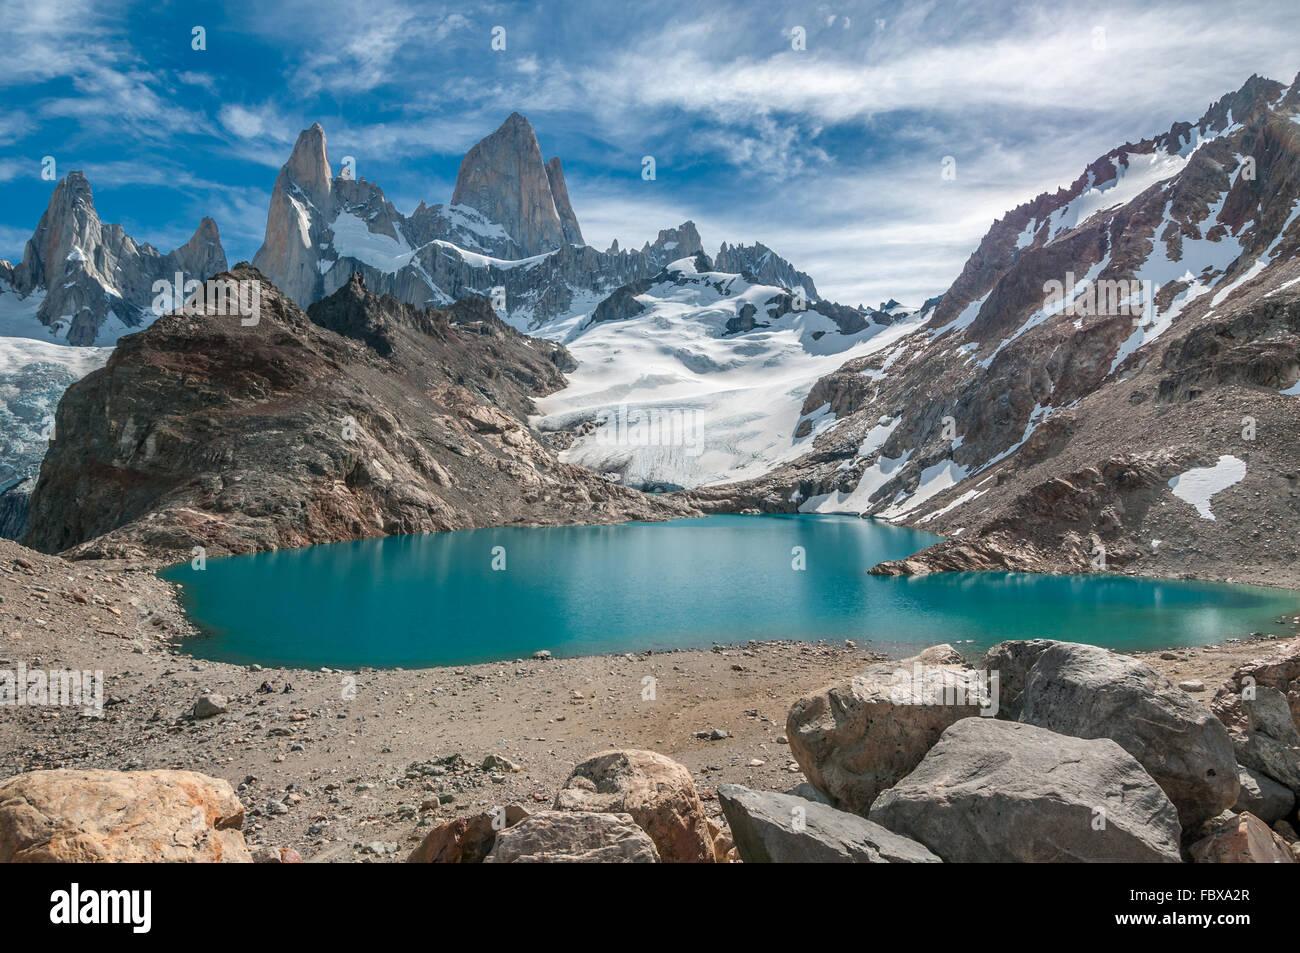 Fitz Roy Berg und Laguna de Los Tres, Patagonien, Argentinien Stockbild